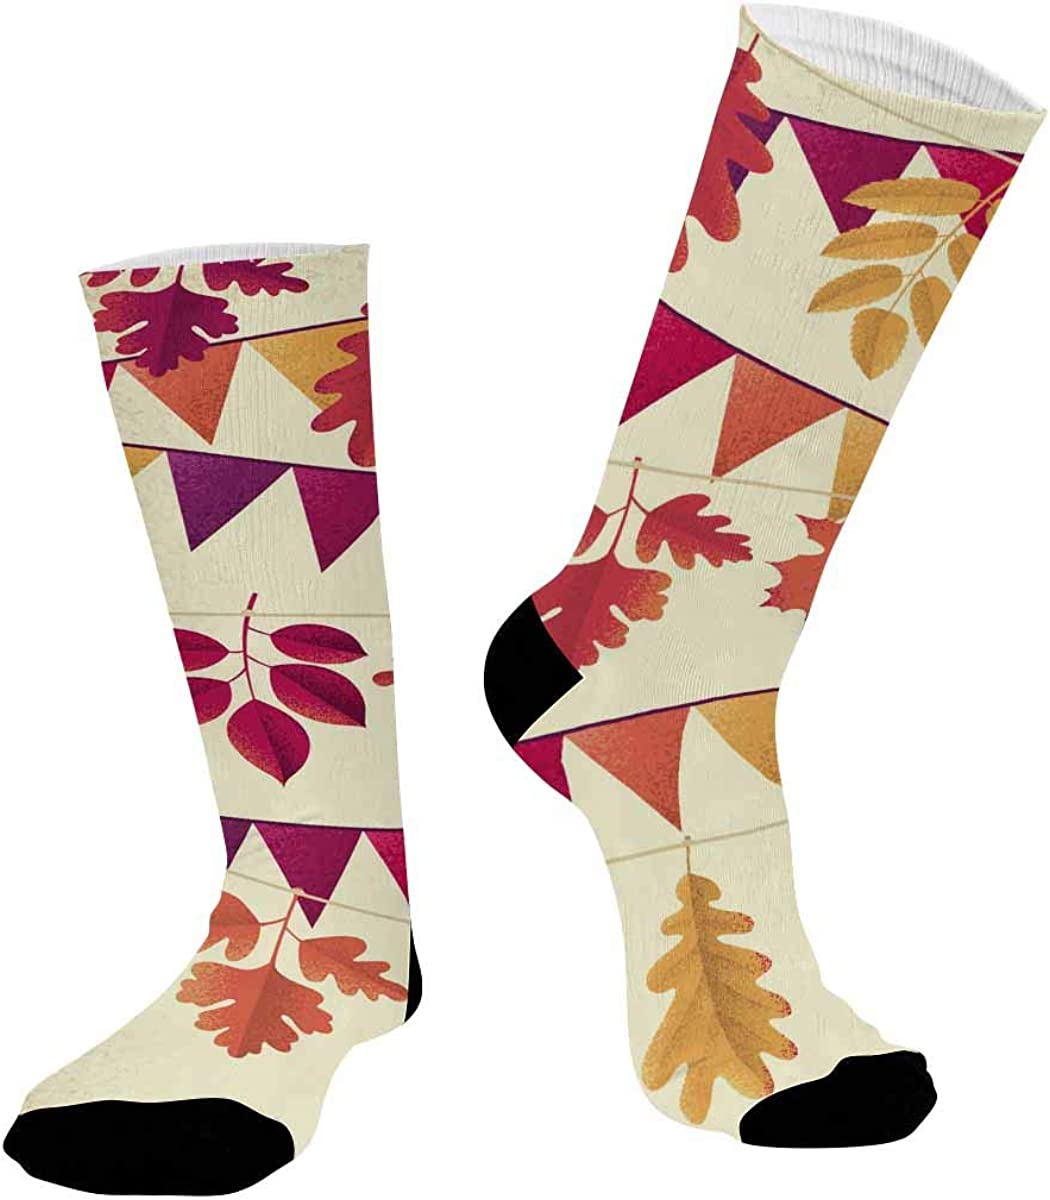 INTERESTPRINT Sublimated Crew Casual Athletic Socks Autumn Leaves Flag